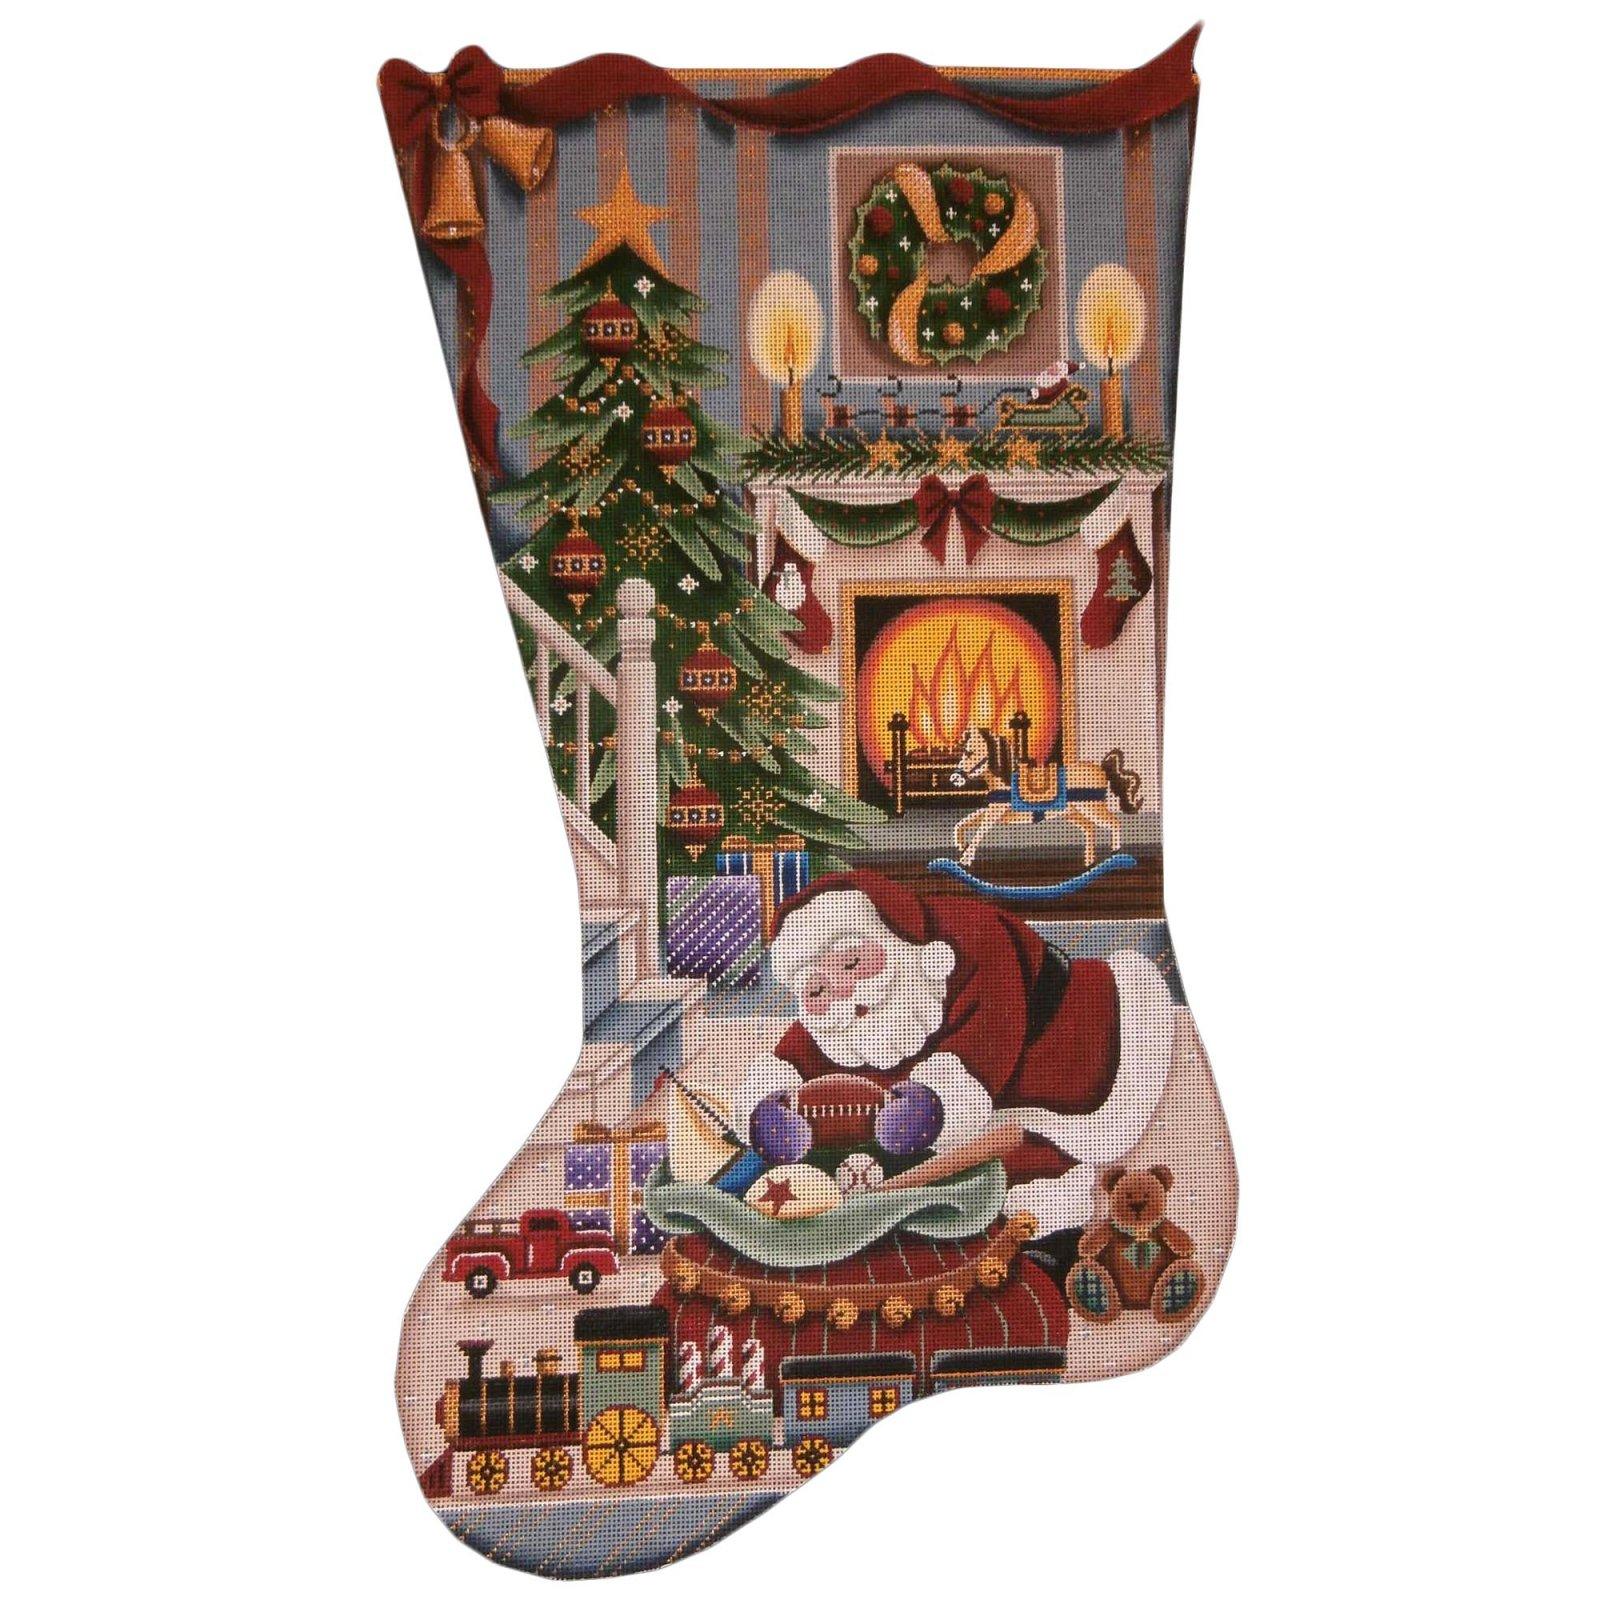 RWD/1394B Christmas By the Fire, Boy